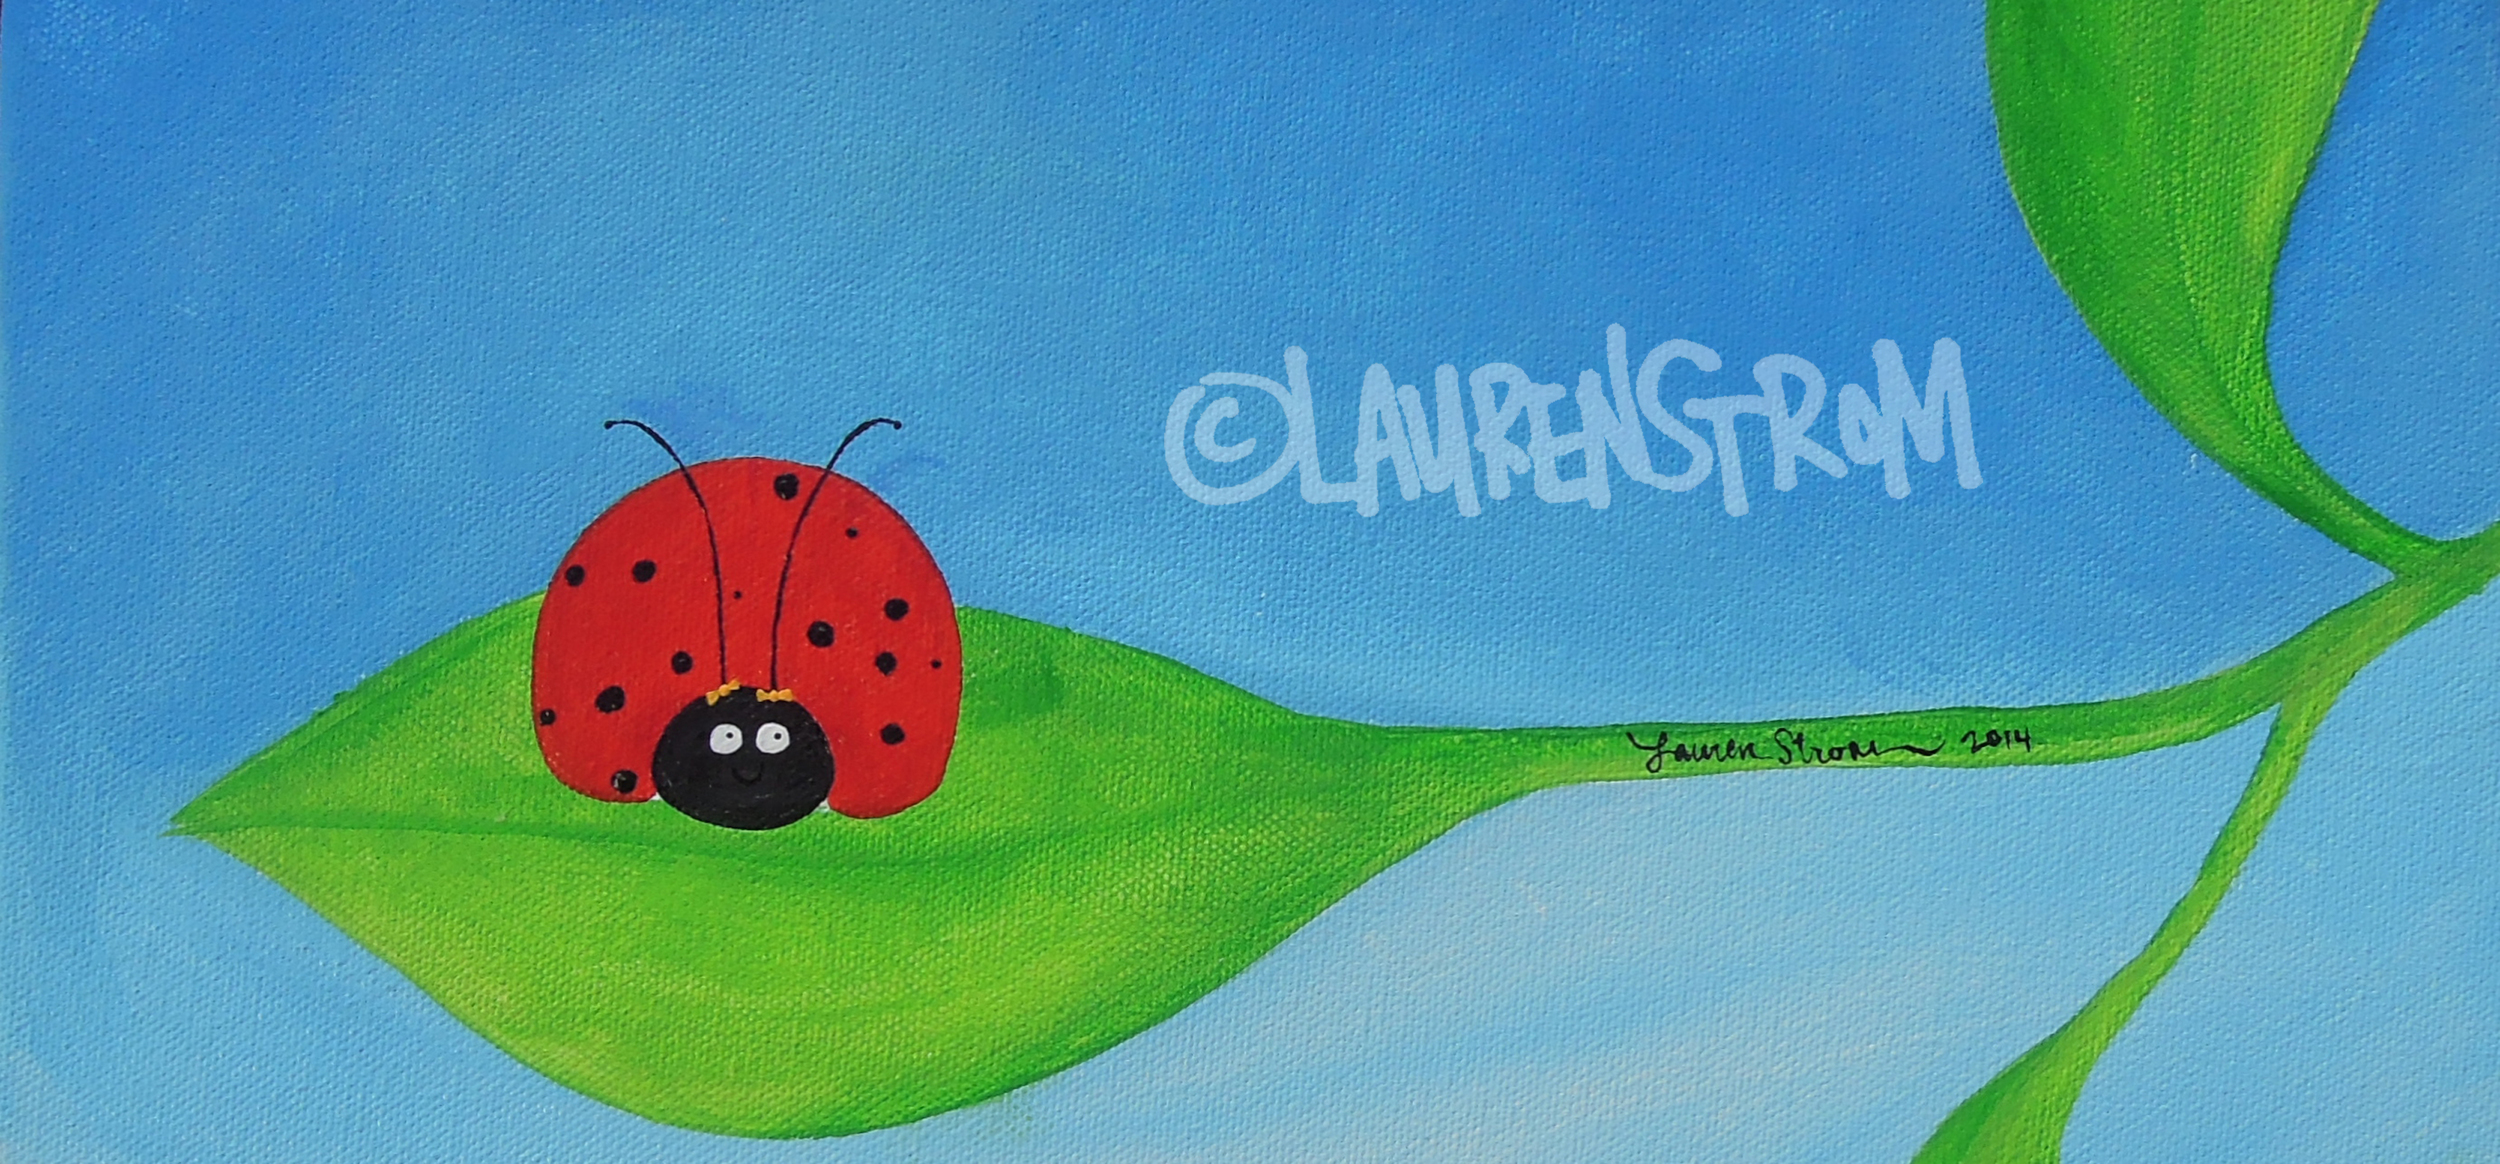 Lanie-Bug